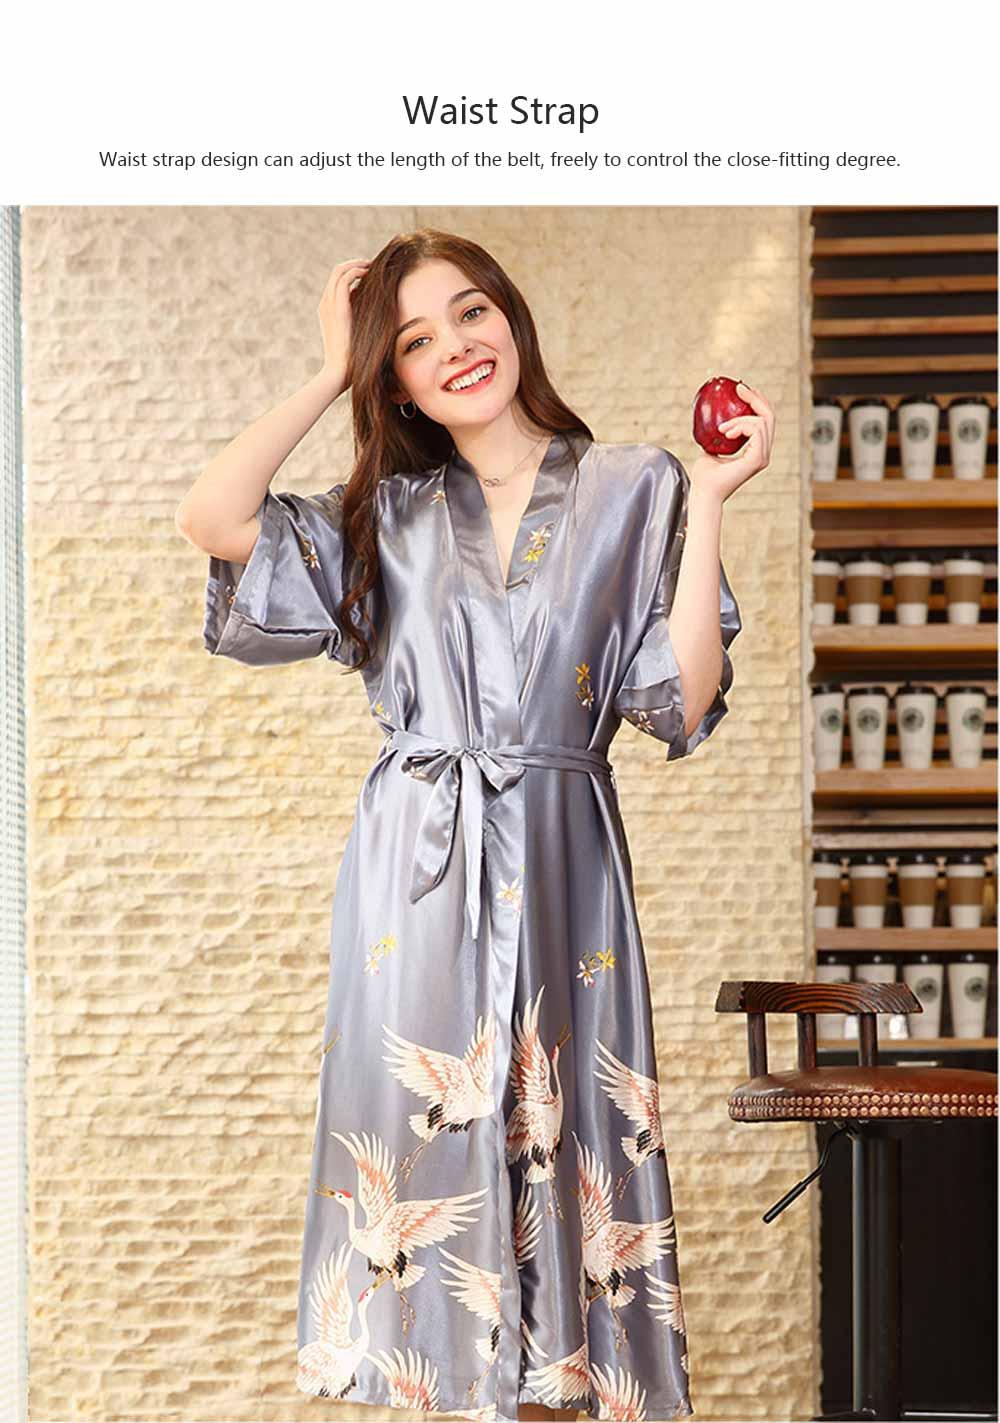 Long Sleeved Imitation Silk Fabric Sexy Bathrobe, Beautiful Printing Pattern  Ladies' Pajamas Women Sleepwear 5